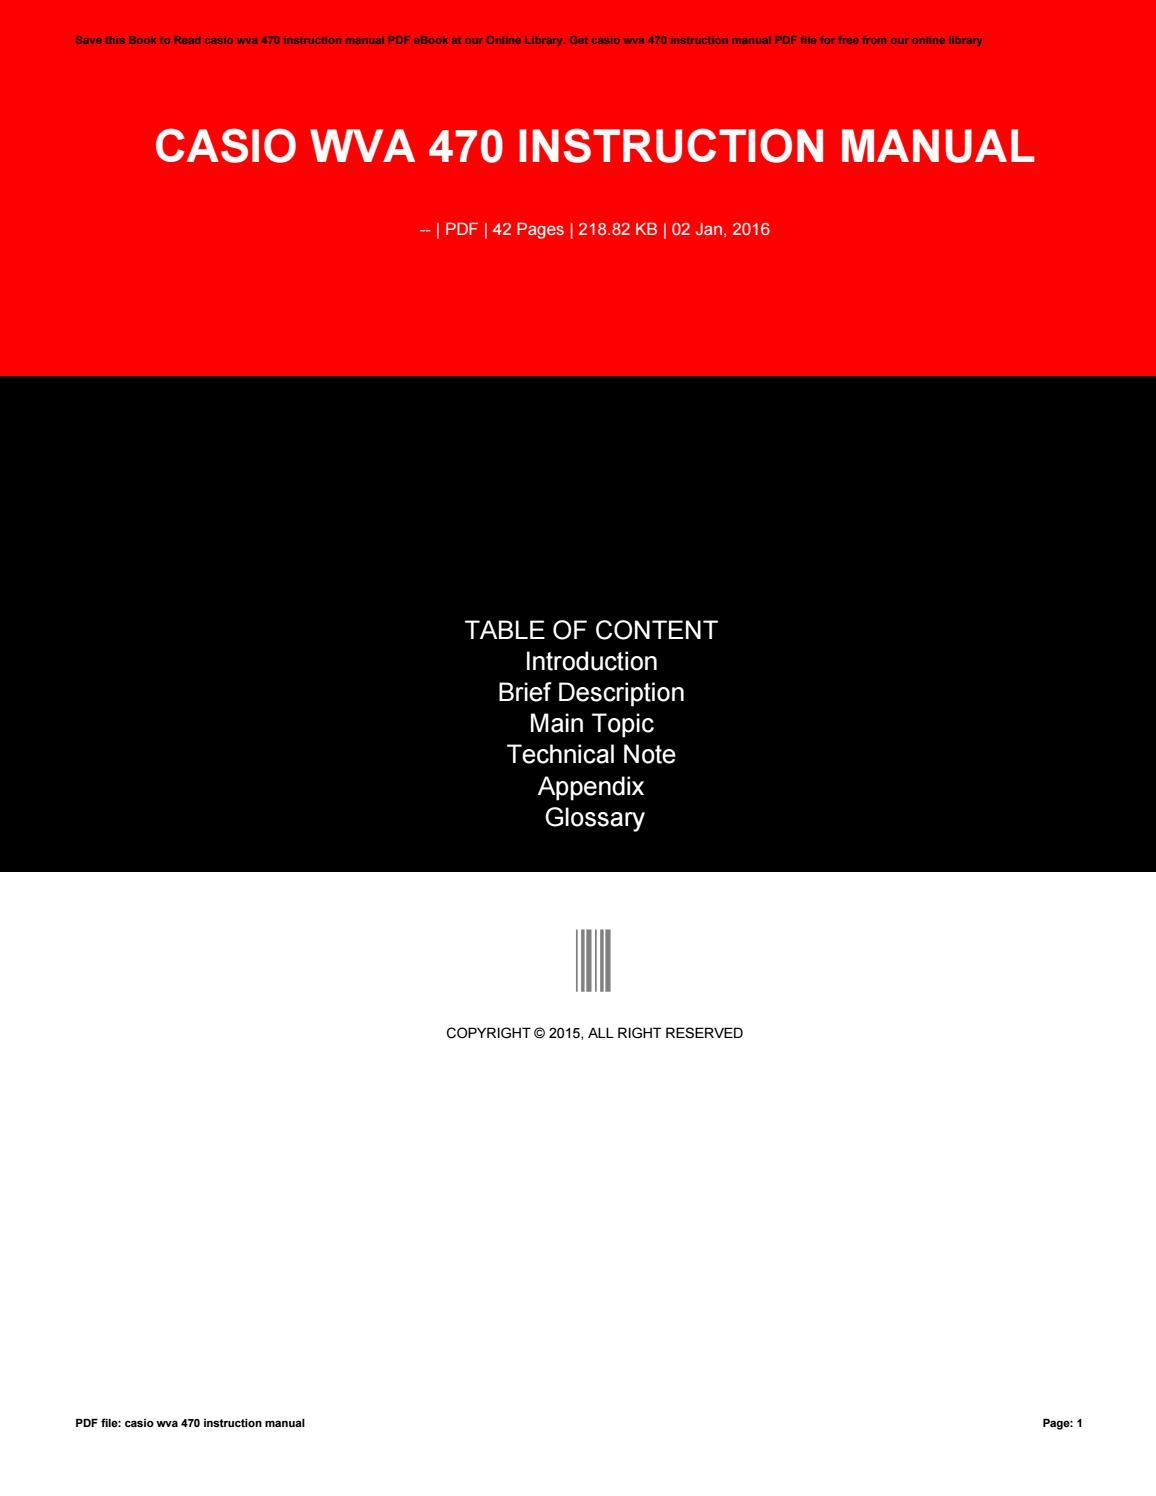 Casio wva 470 instruction manual by t3983 issuu.